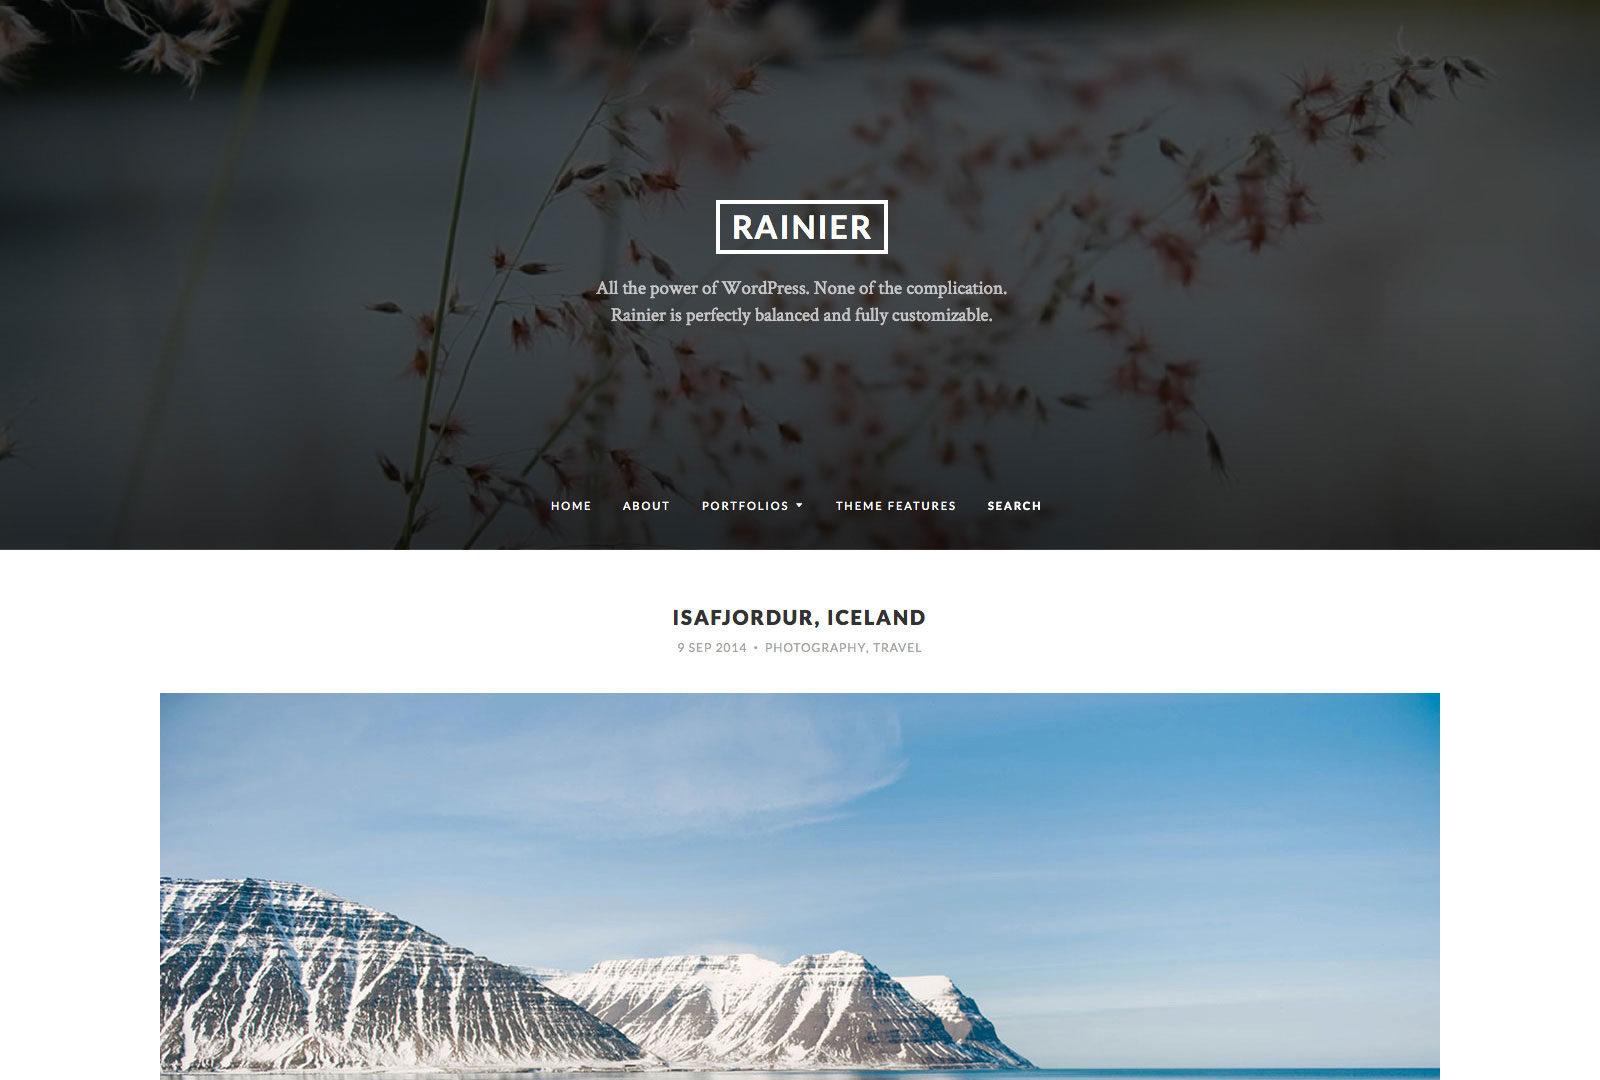 Screenshot of the Rainier theme